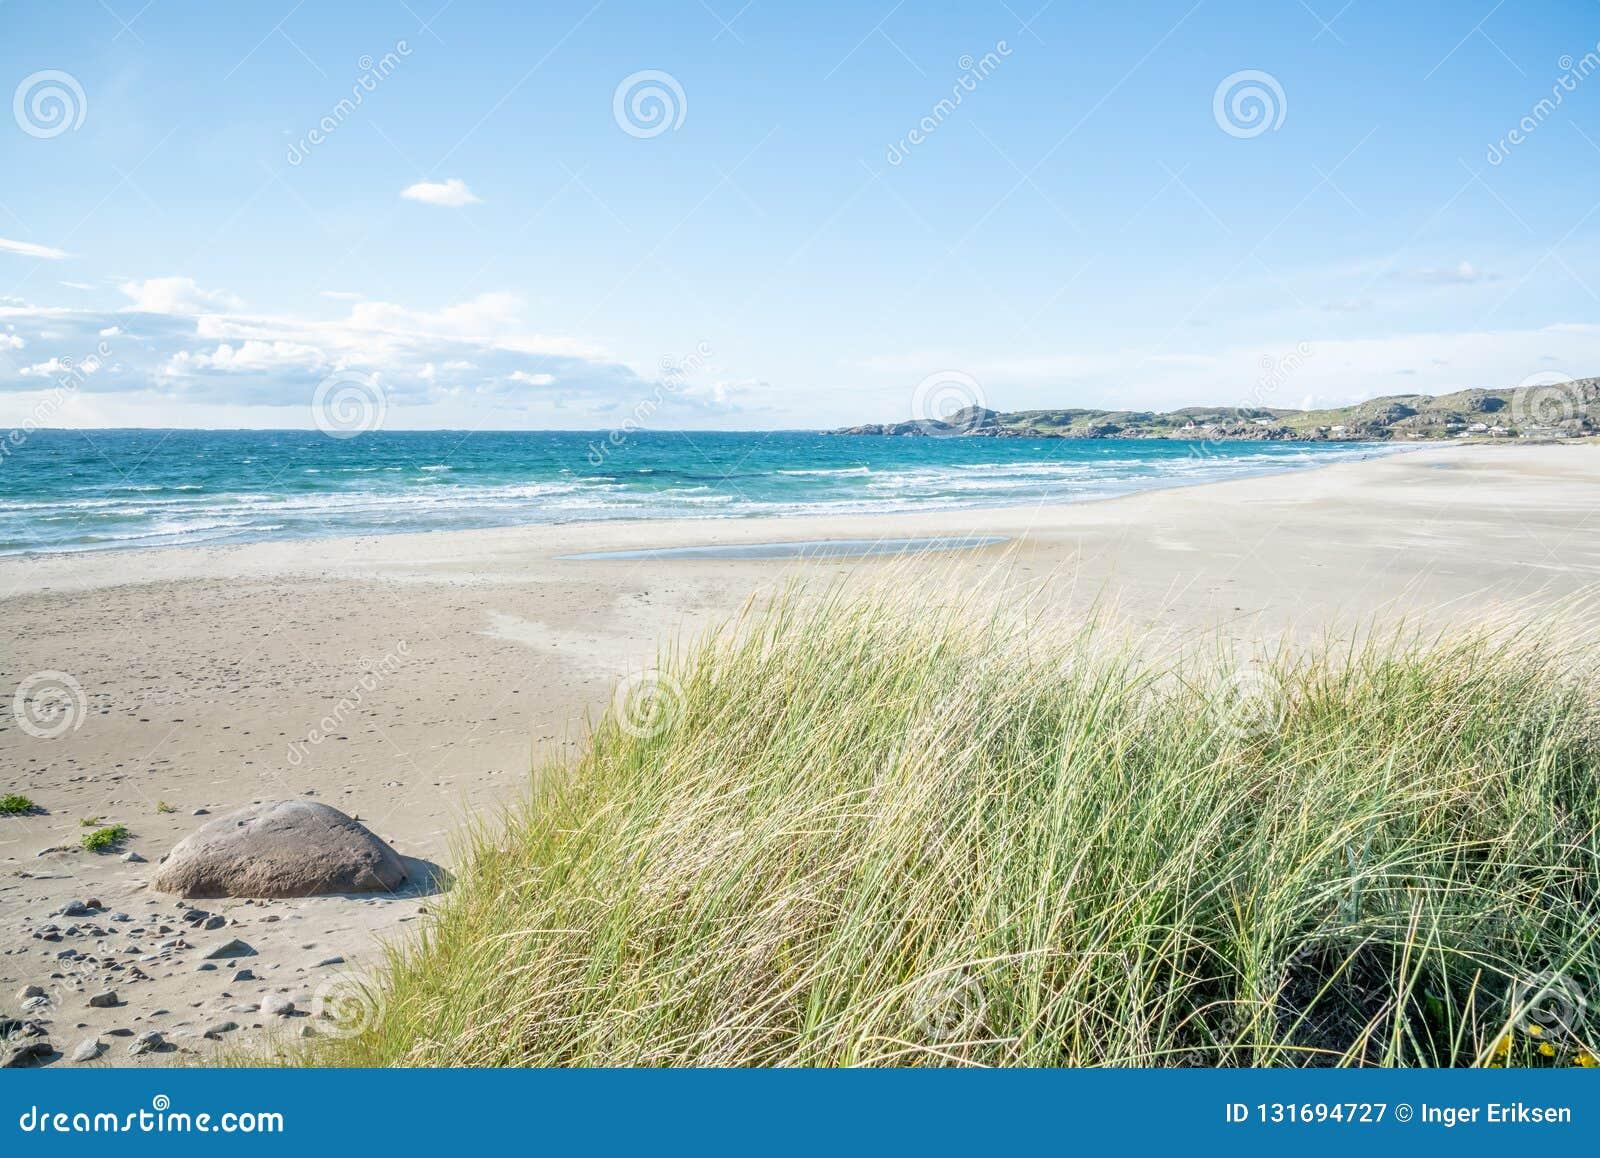 Hellestø海滩和沙丘在斯塔万格,挪威之外